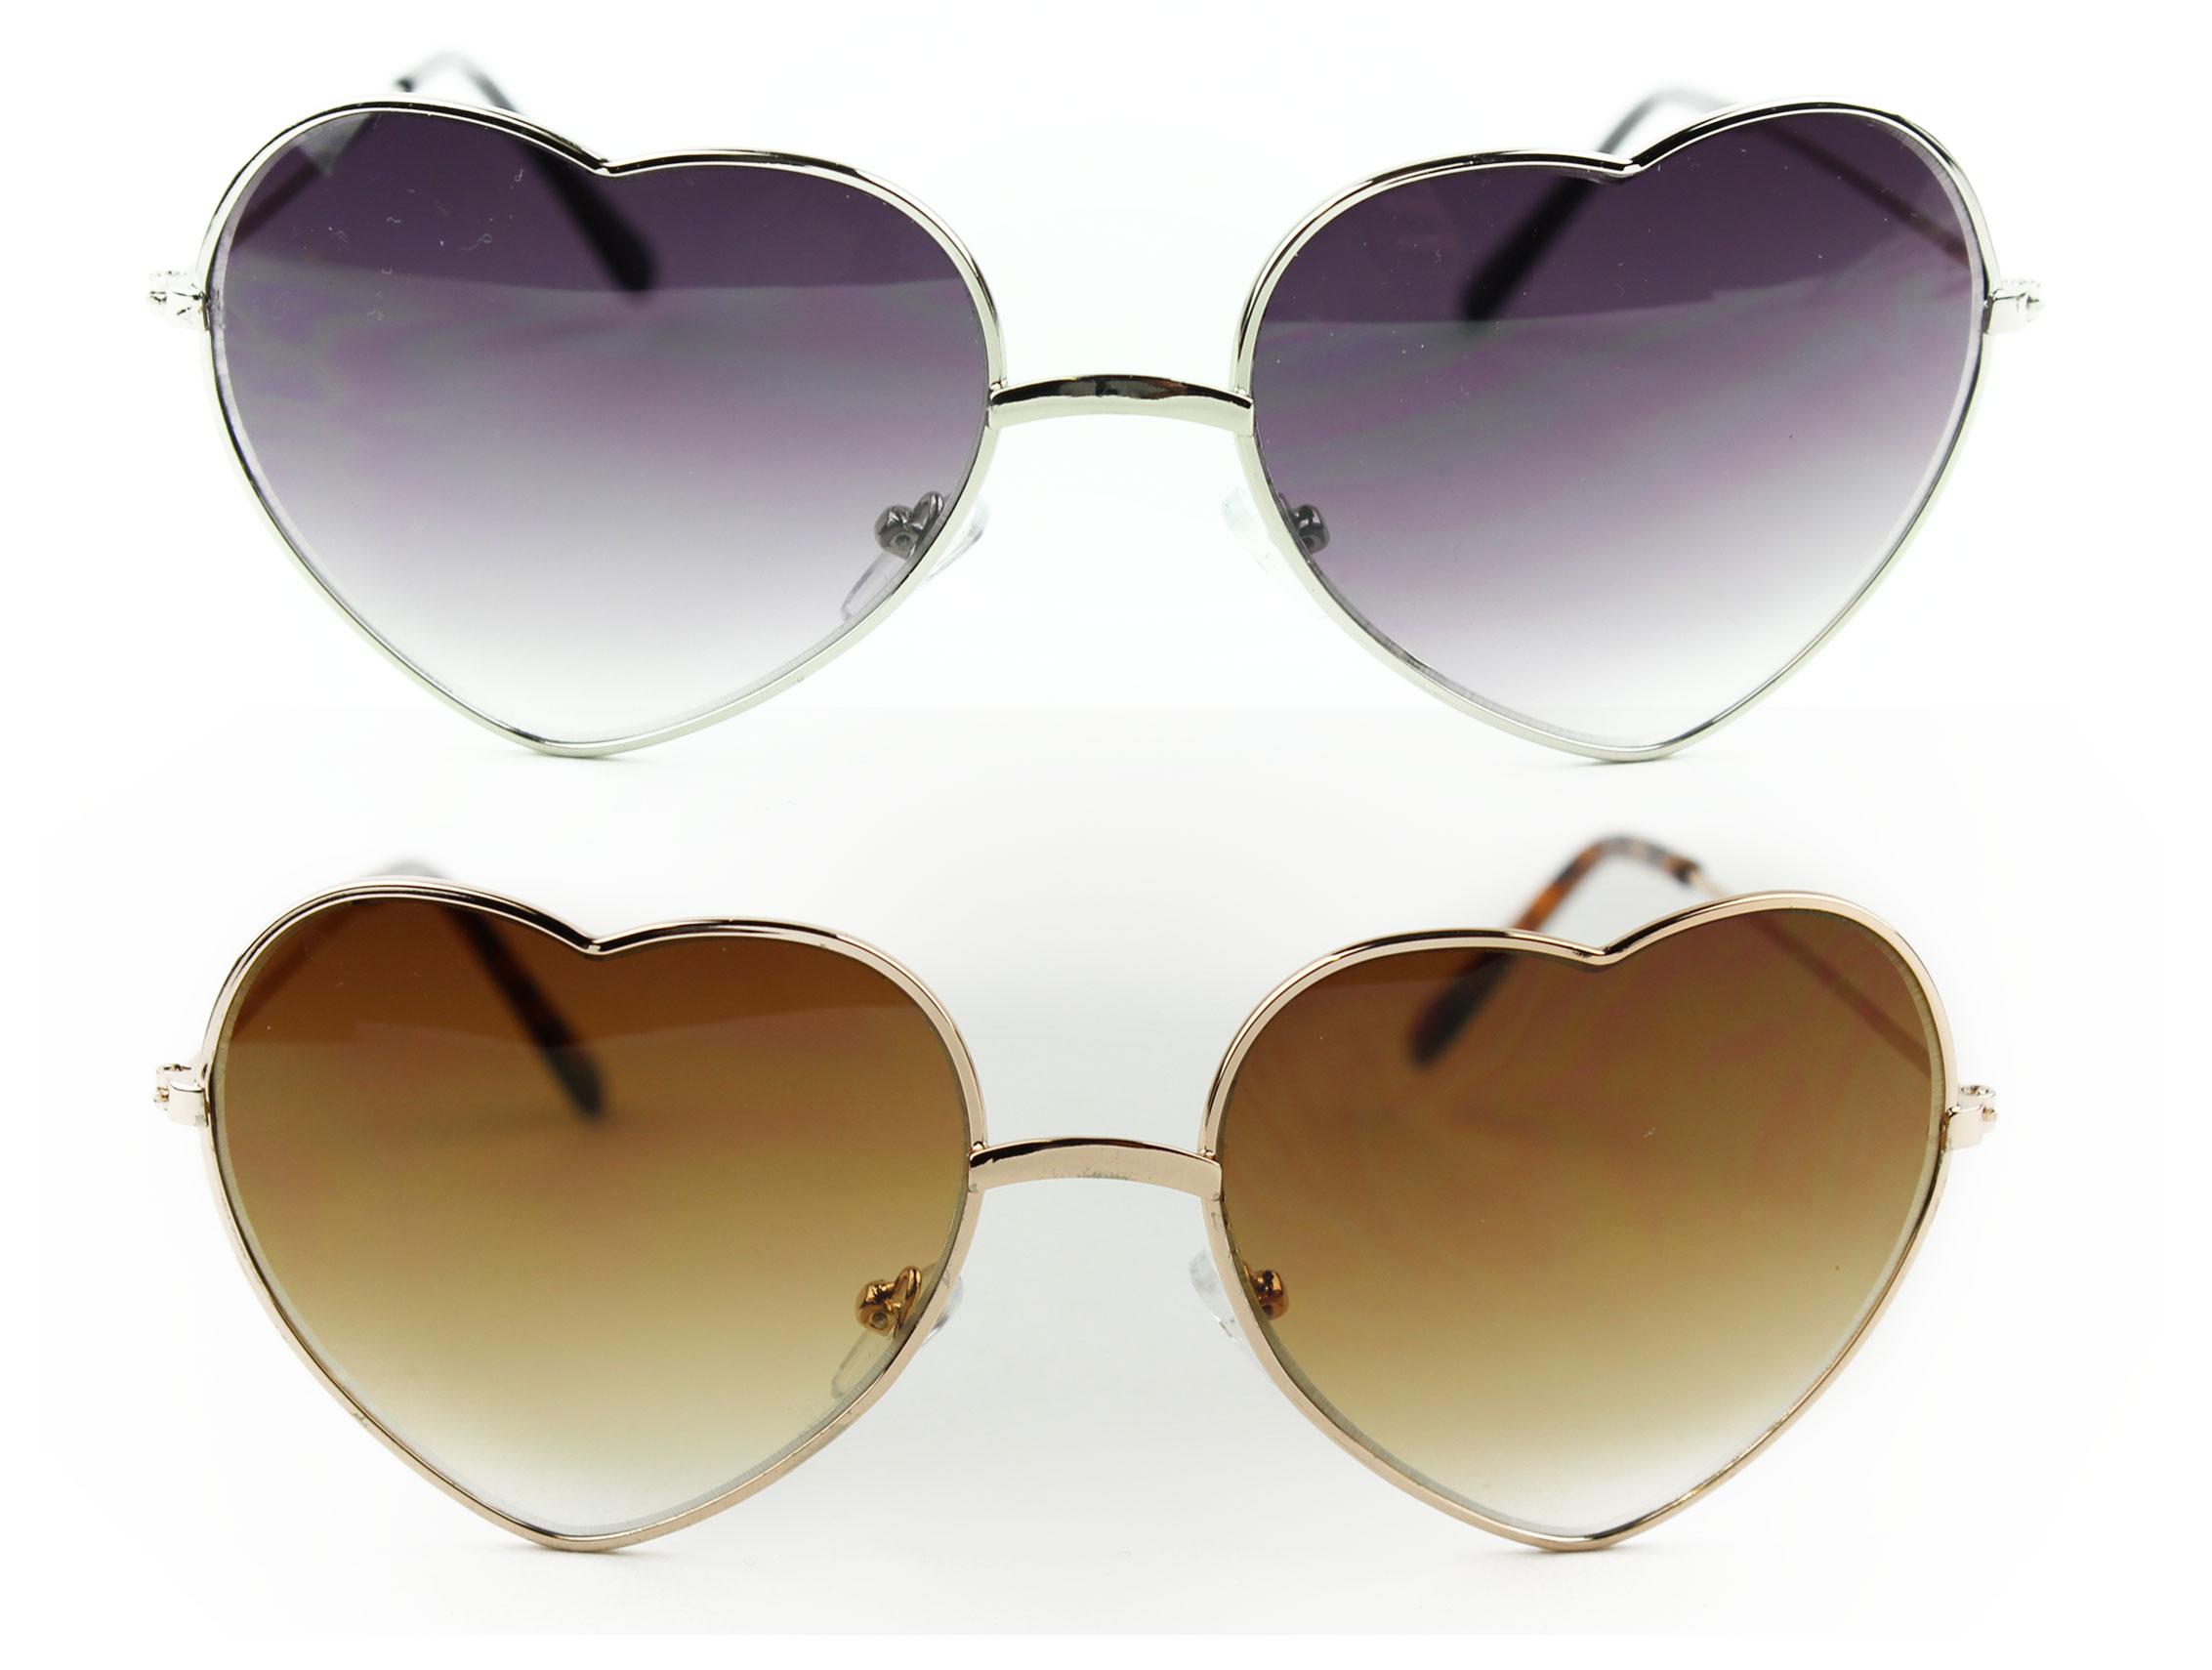 Fashion Heart Shaped Sunglasses Metal Frame Sunglasses Shades Gold and Silver   eBay